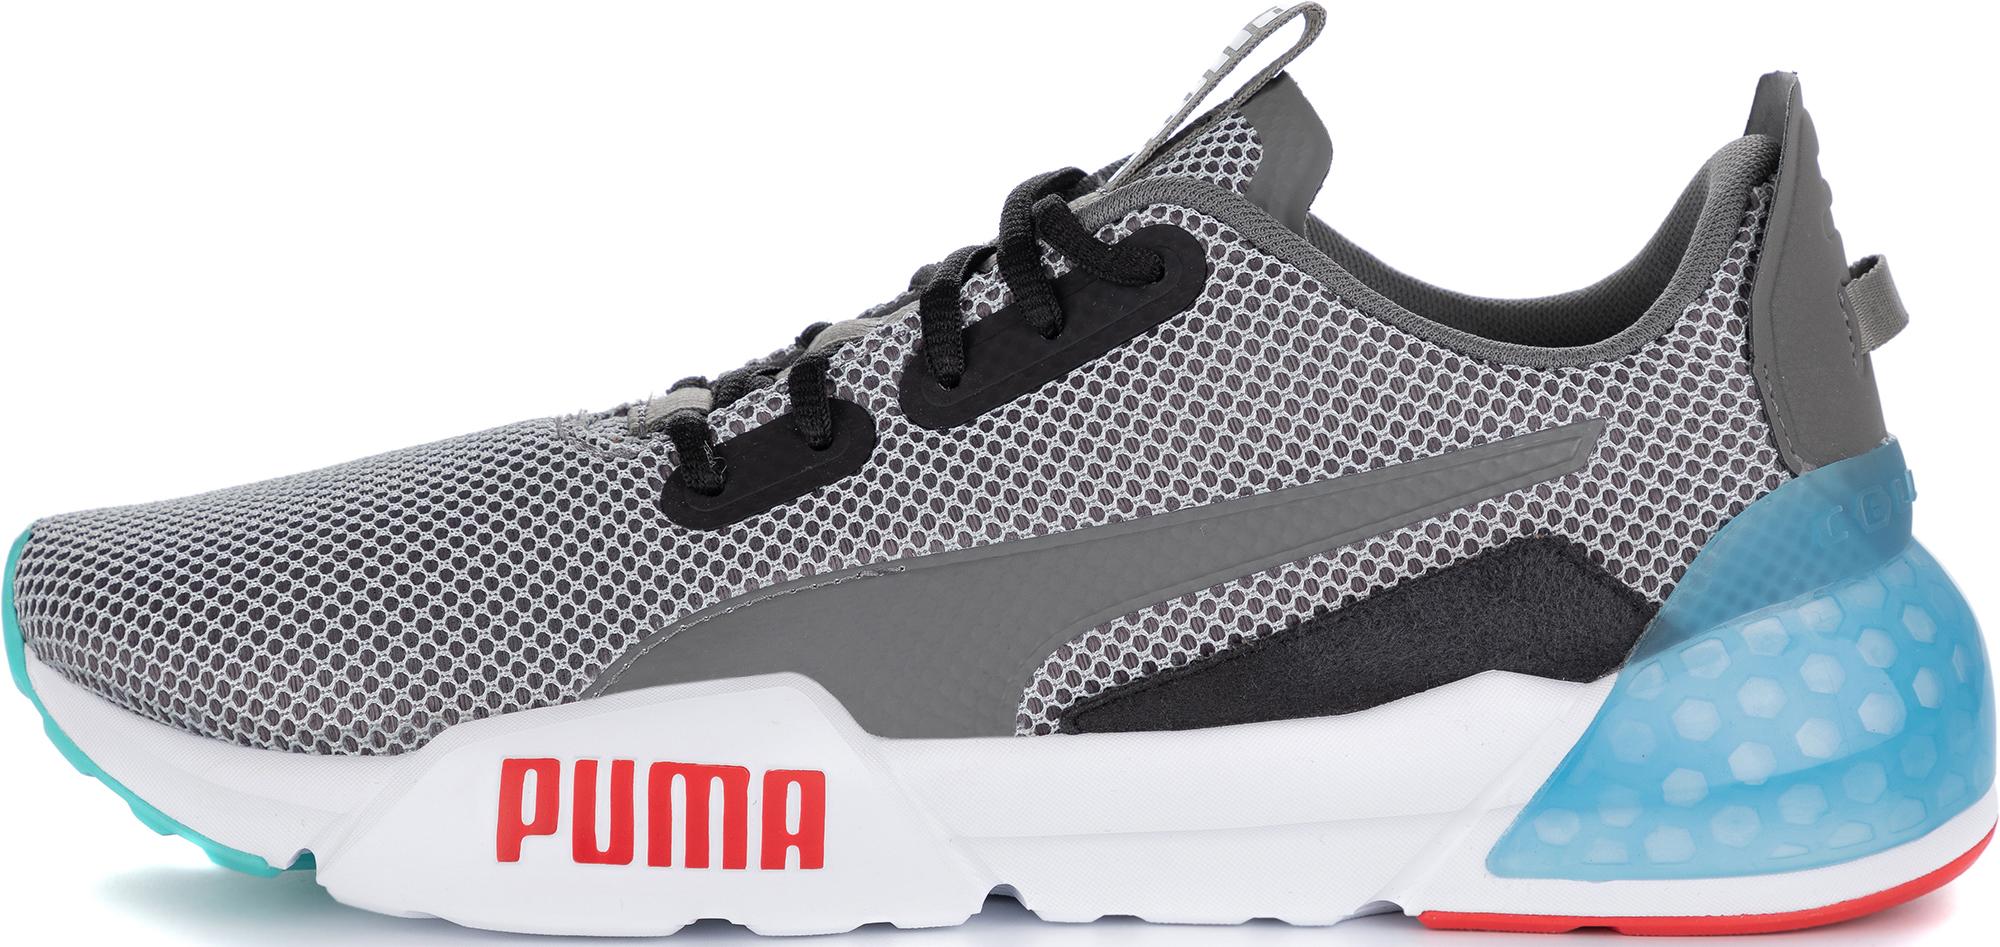 Puma Кроссовки мужские Puma Cell Phase, размер 47,5